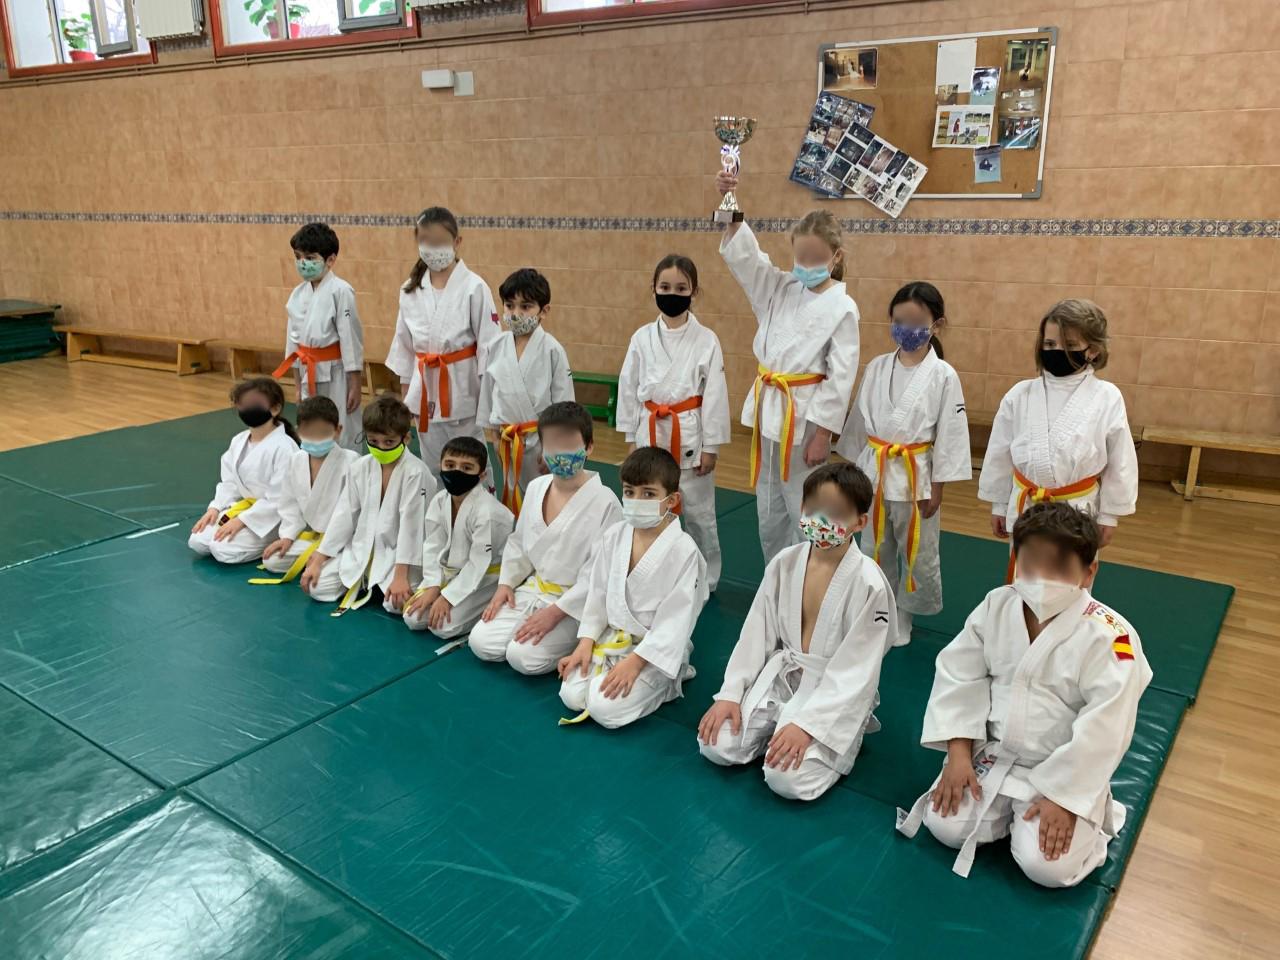 examenes-judo-2021-pixeladas